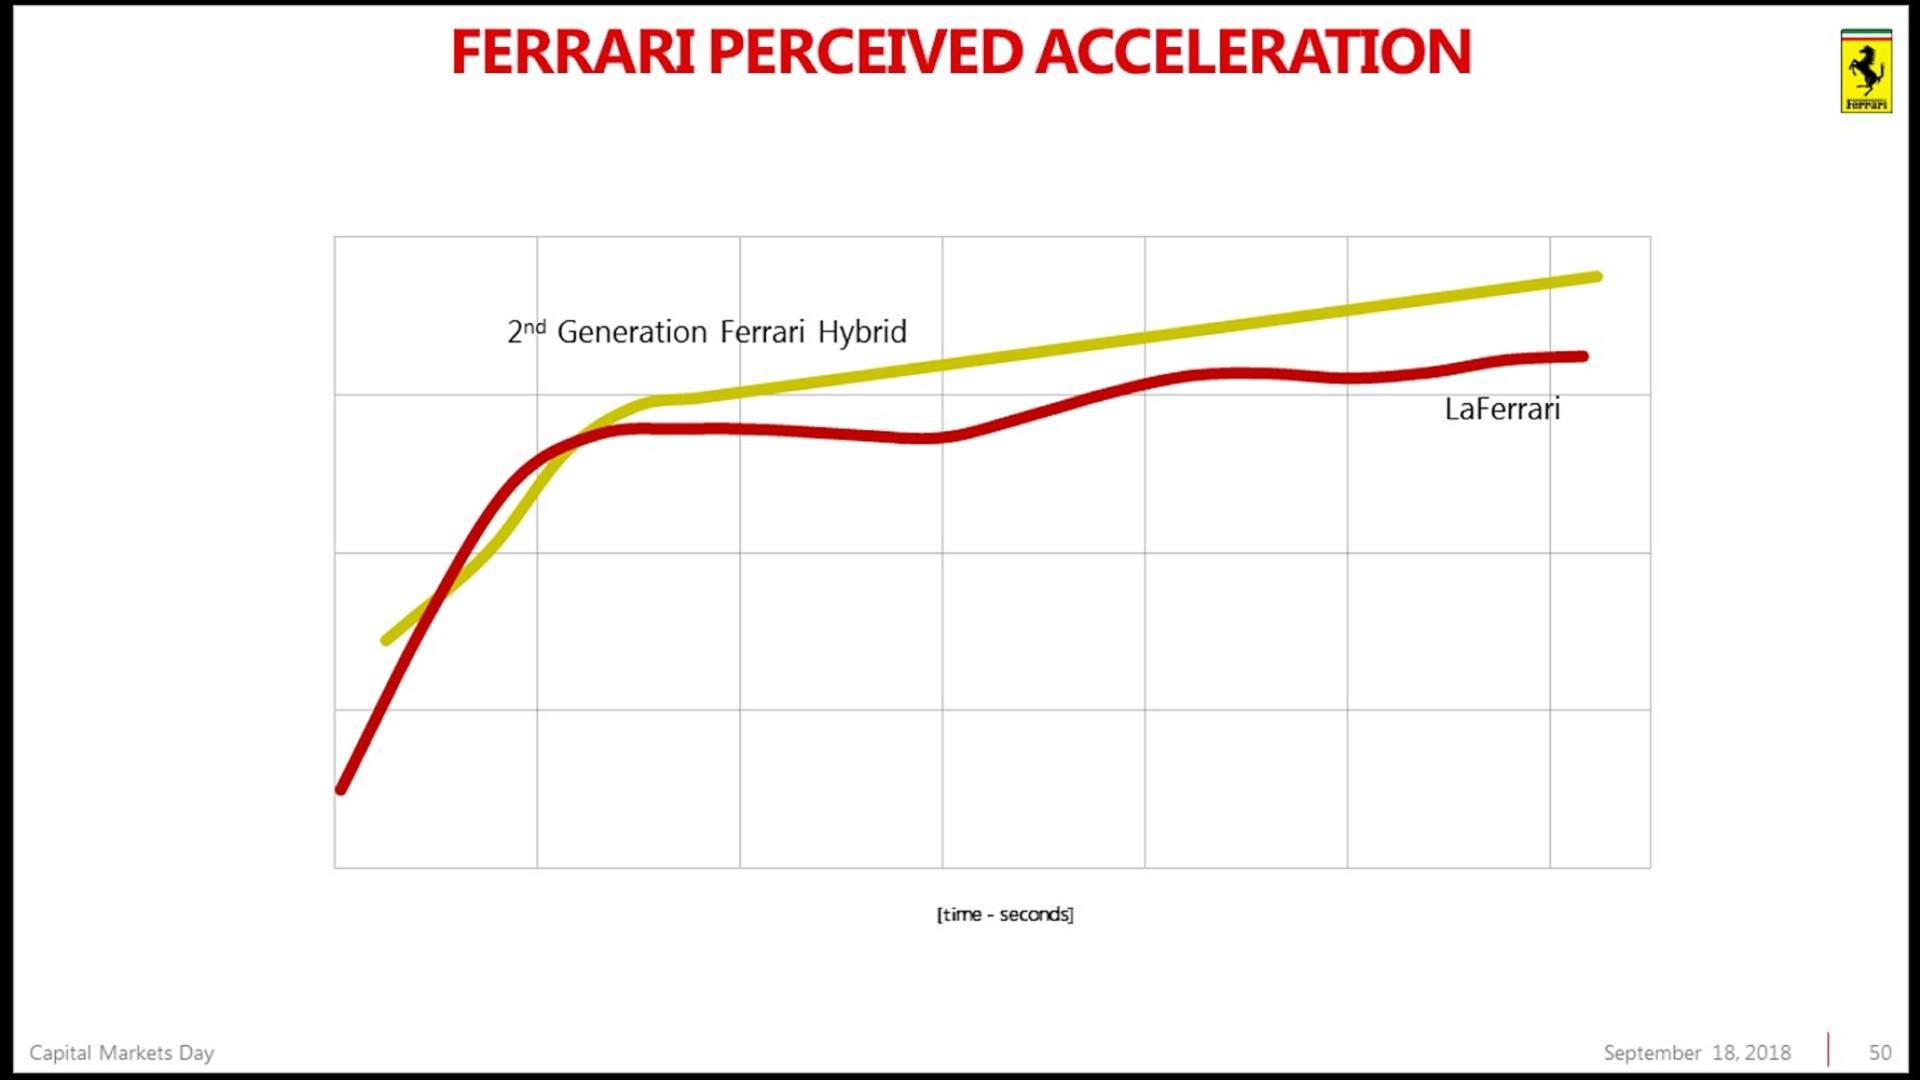 Piano Industriale Ferrari 2018-2022 (41)